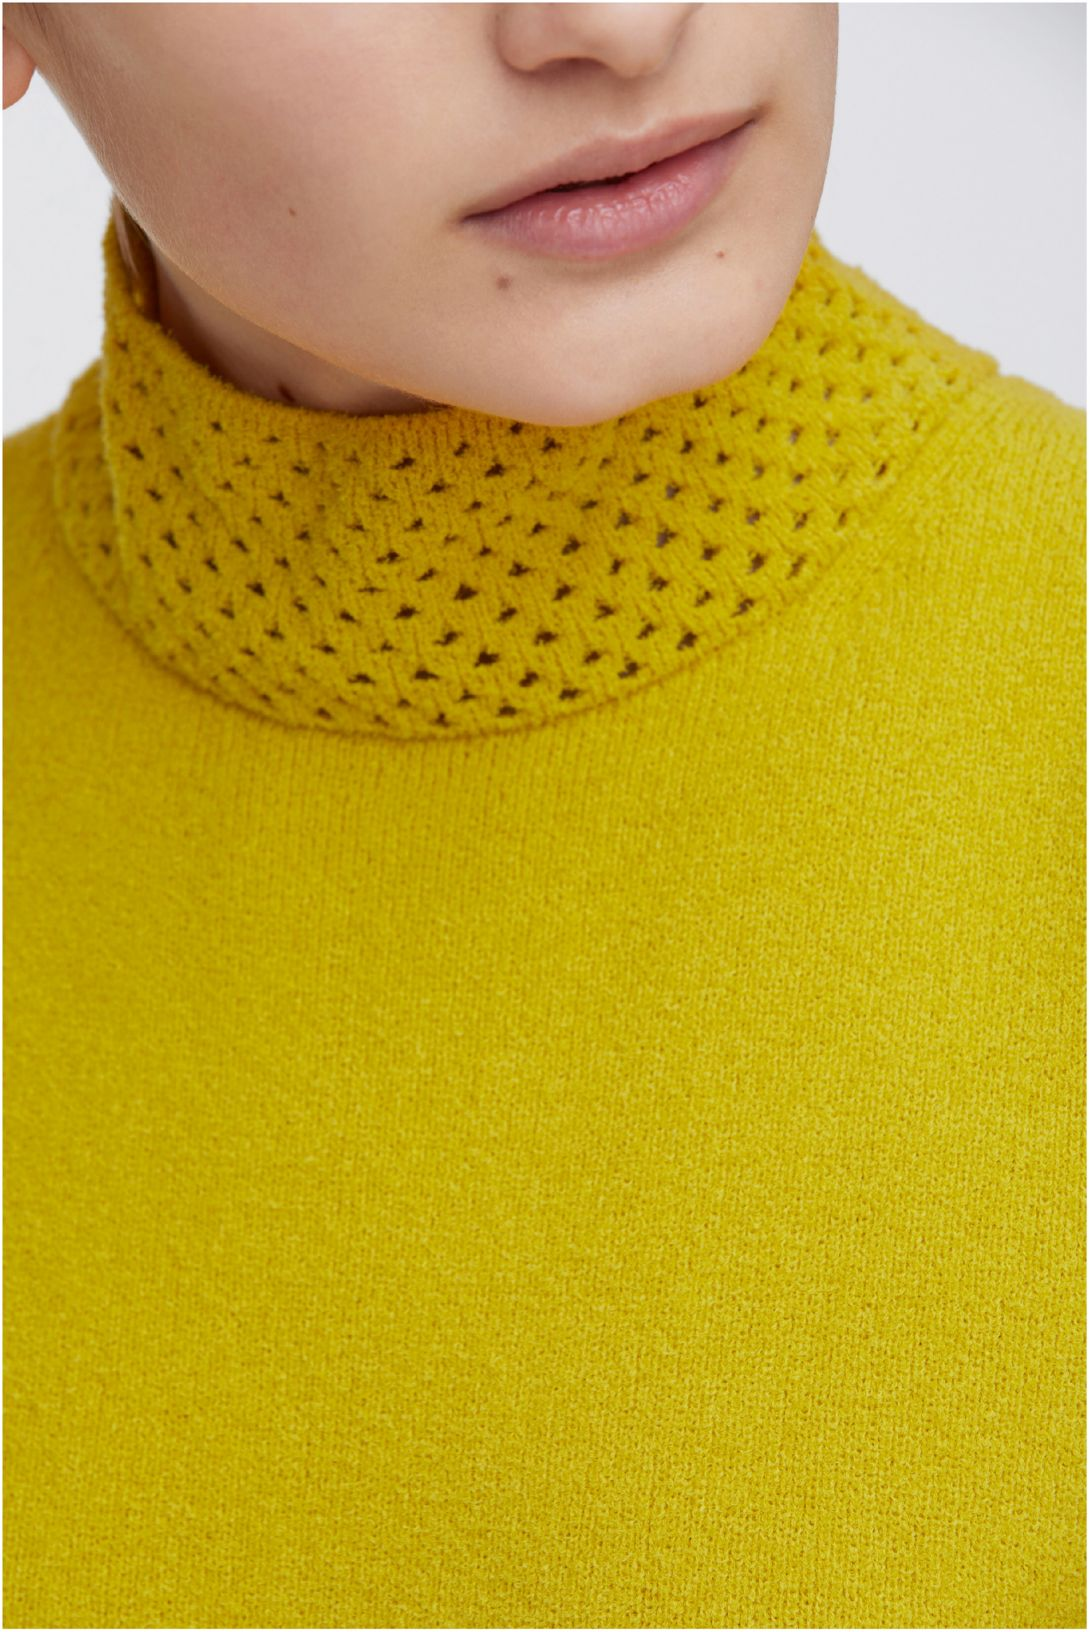 Arket H&M: Mustard Yellow